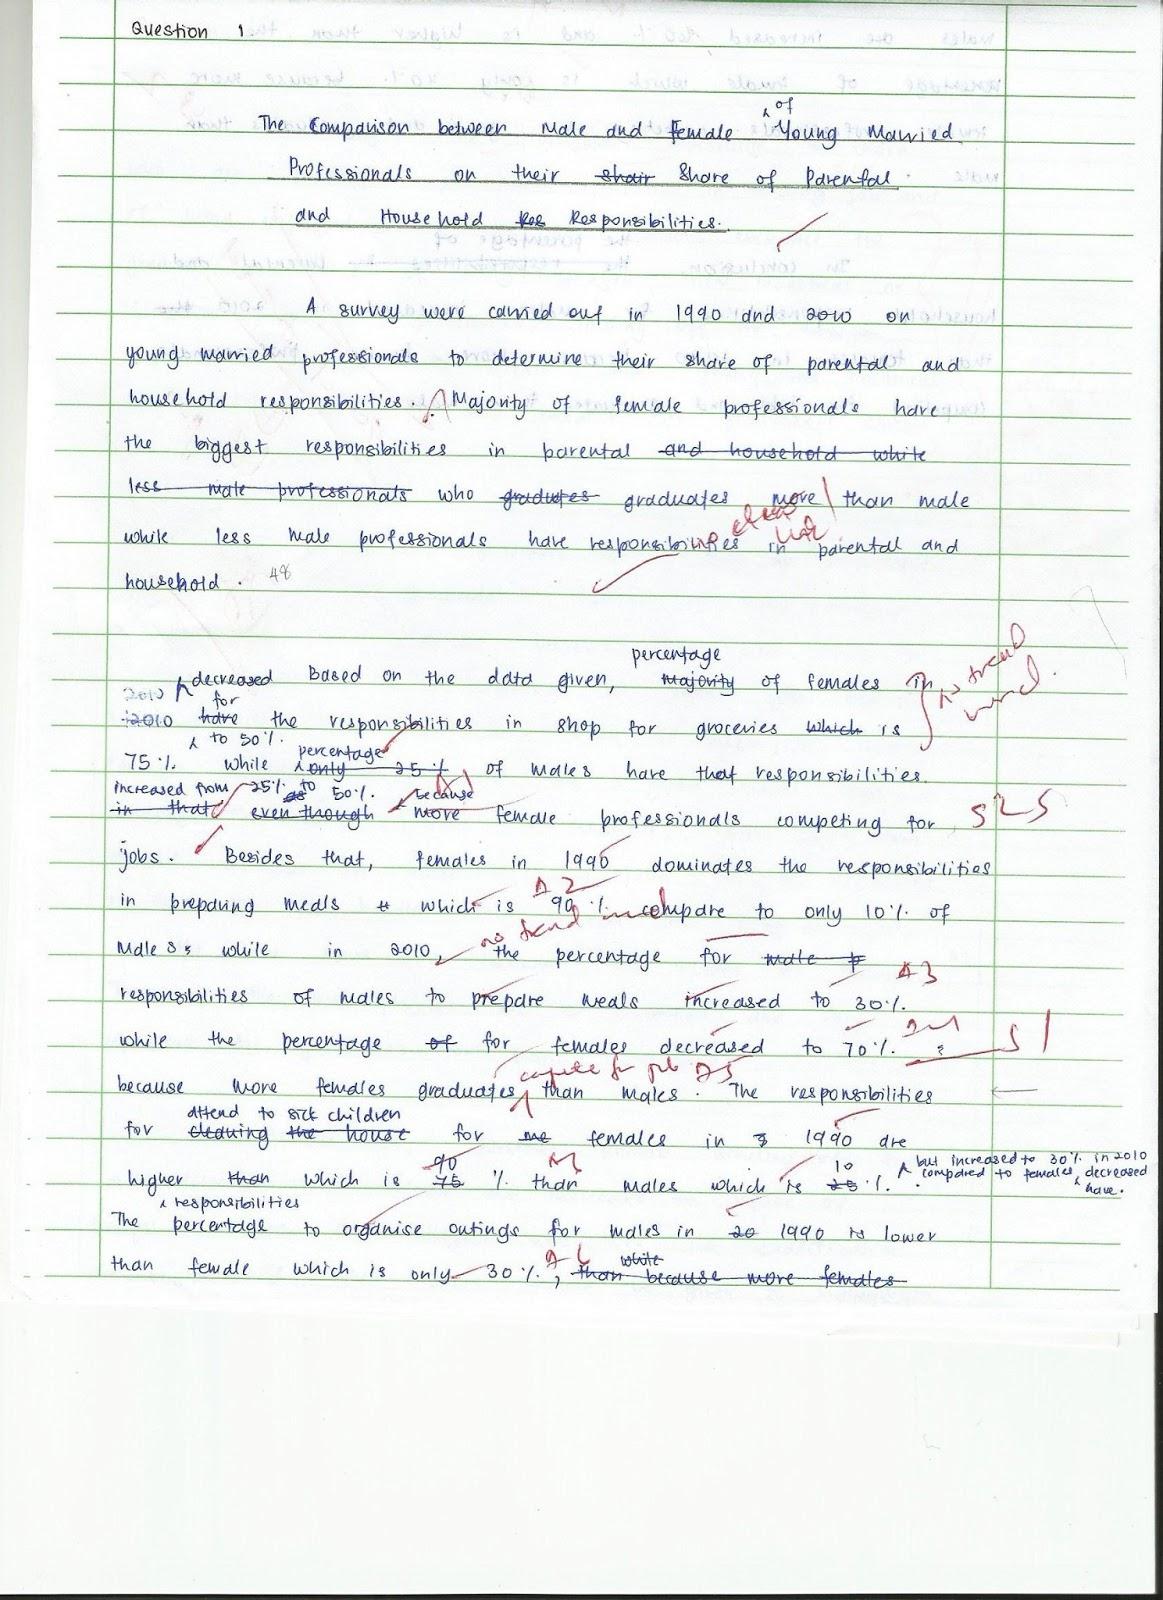 400 Word Essay 150 Words Essay How To Write A 300 Word Essay Psycho